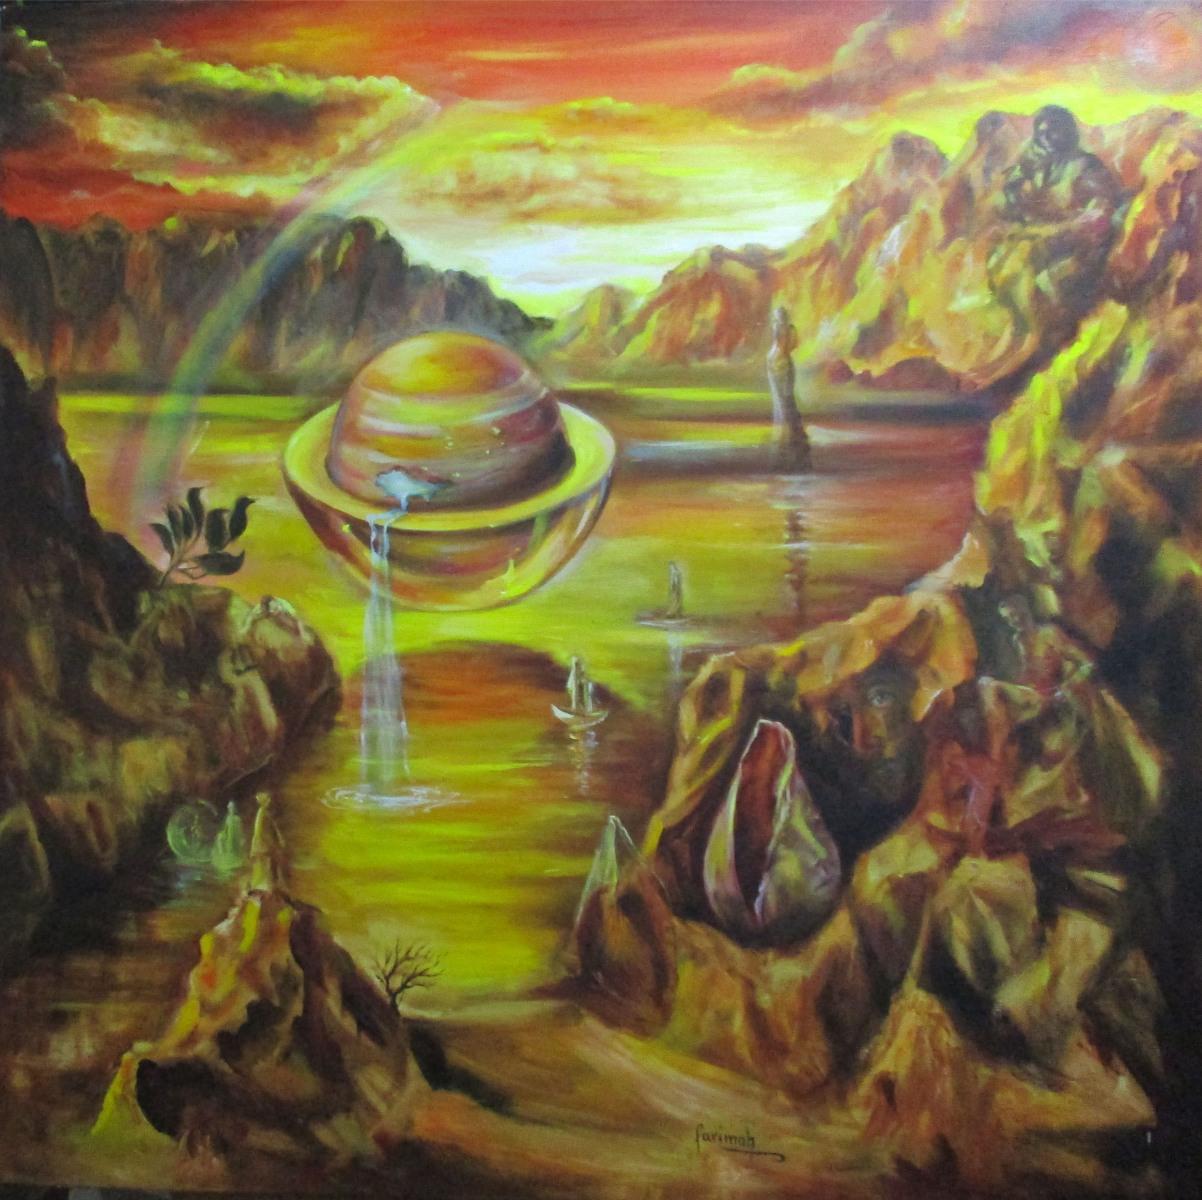 Farimah Eshraghi - The Hidden Valley